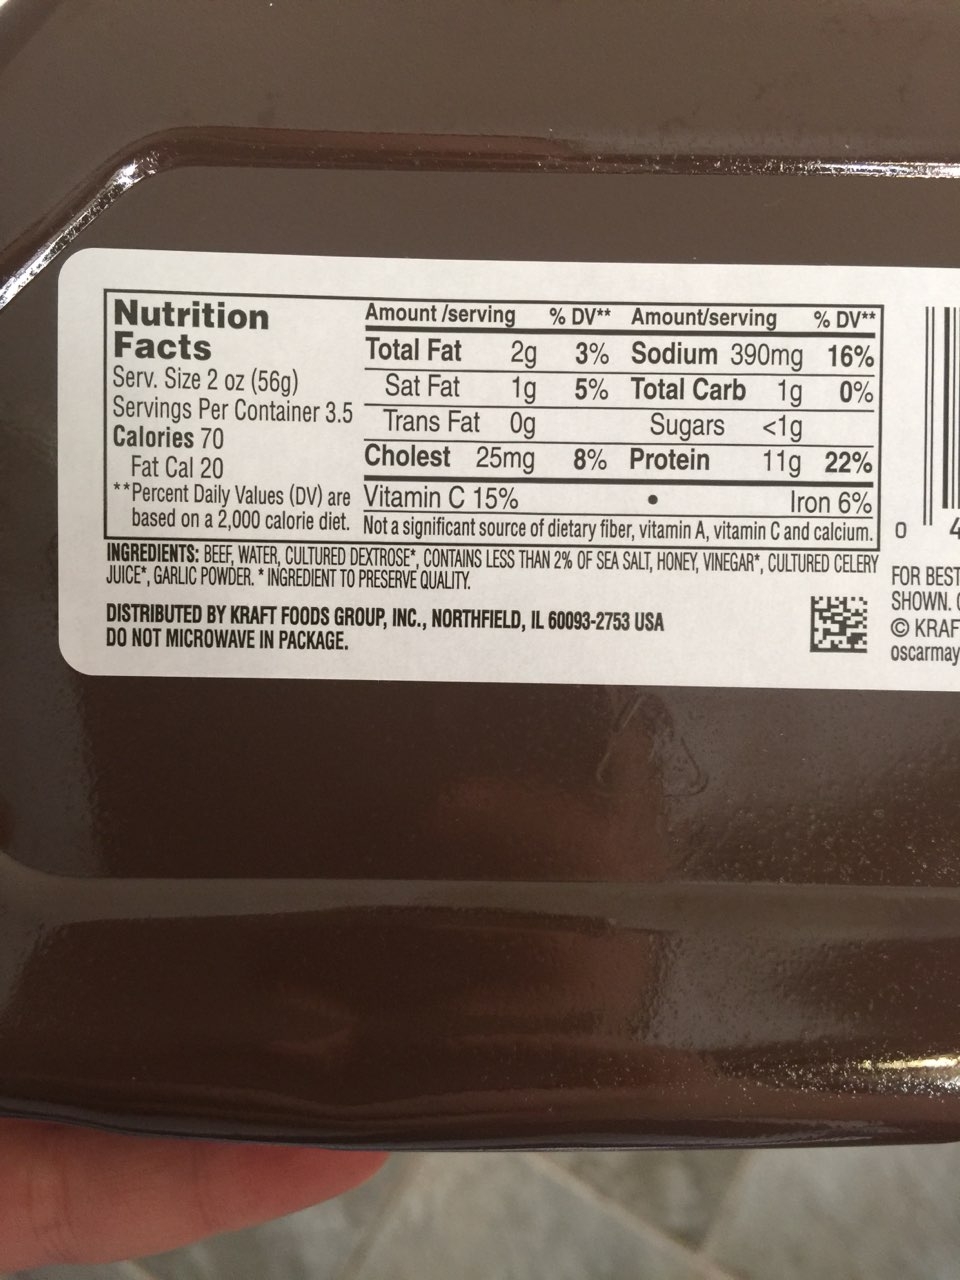 Oscarpg2 in addition Oscar Mayer Turkey Hot Dogs additionally 396478863 additionally Ham Swiss Stromboli Roll Ups also Kraft Heinz Recalls 2m Pounds Oscar Mayer Turkey Bacon After N416146. on oscar mayer selects